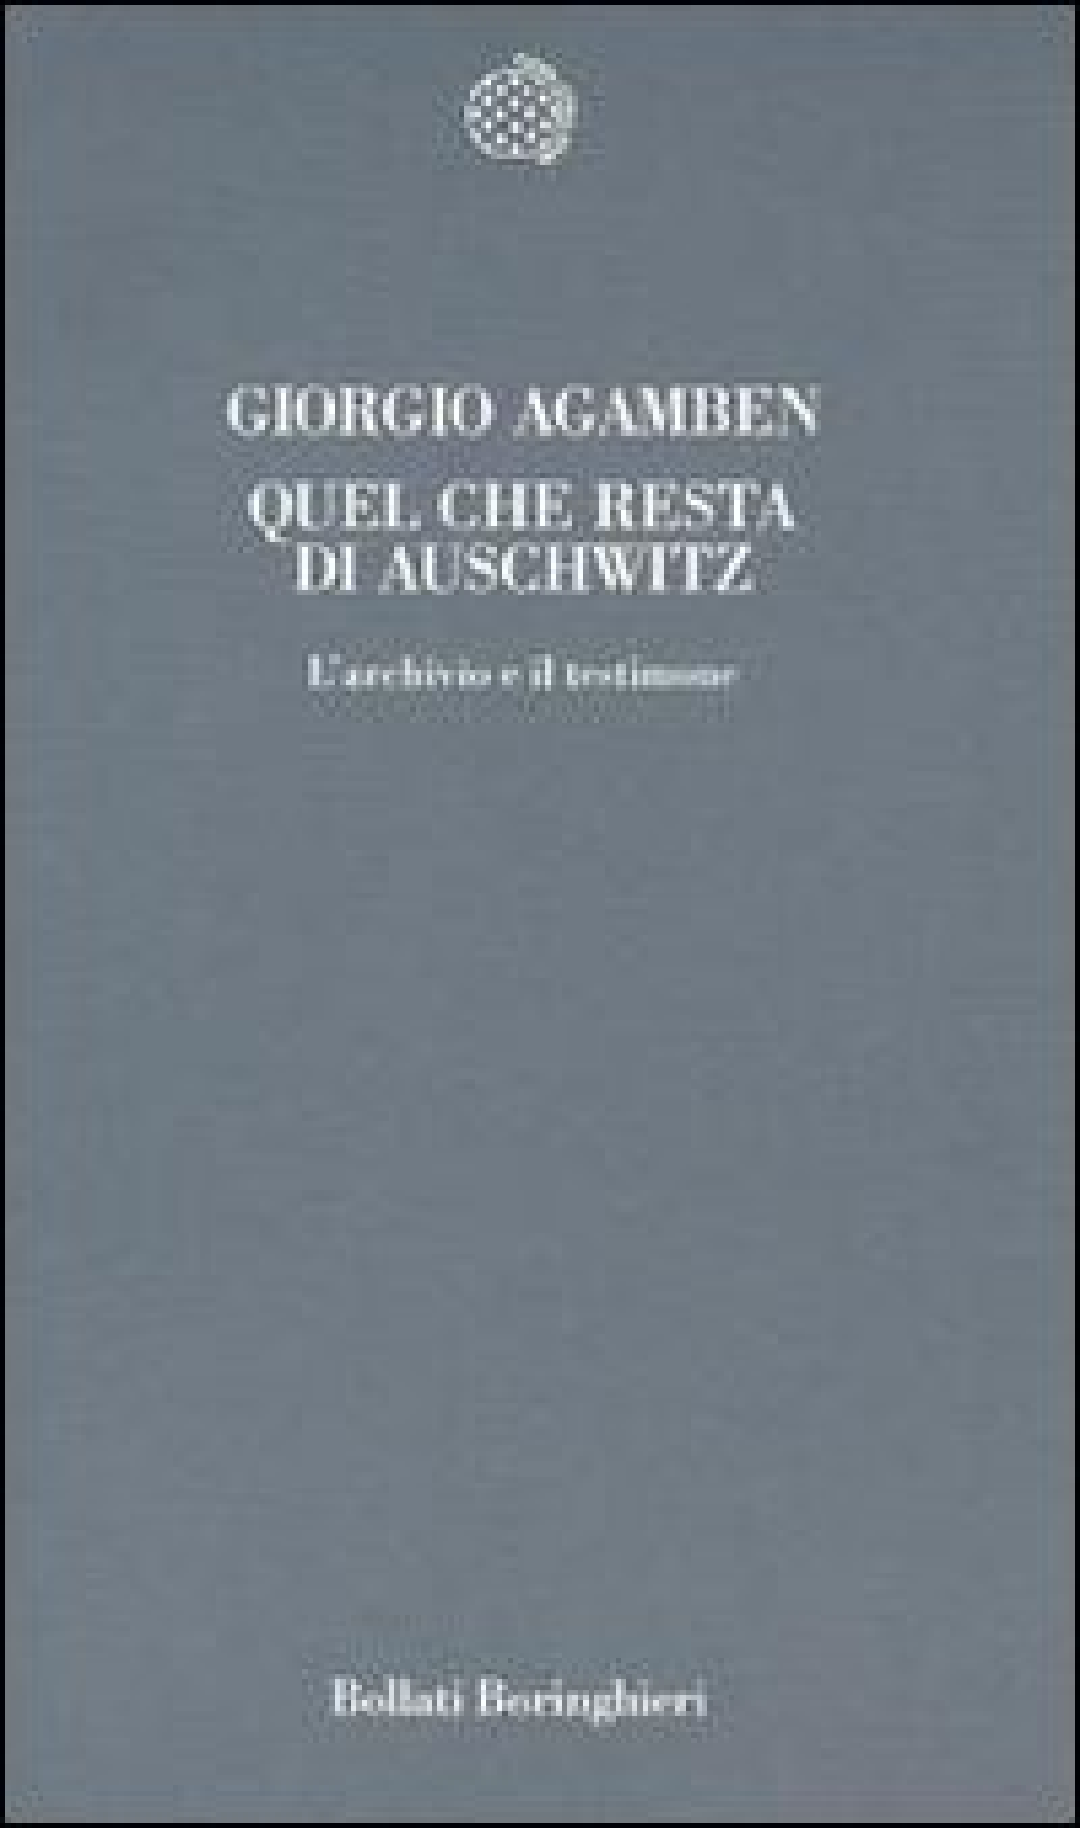 Quel che resta di Auschwitz